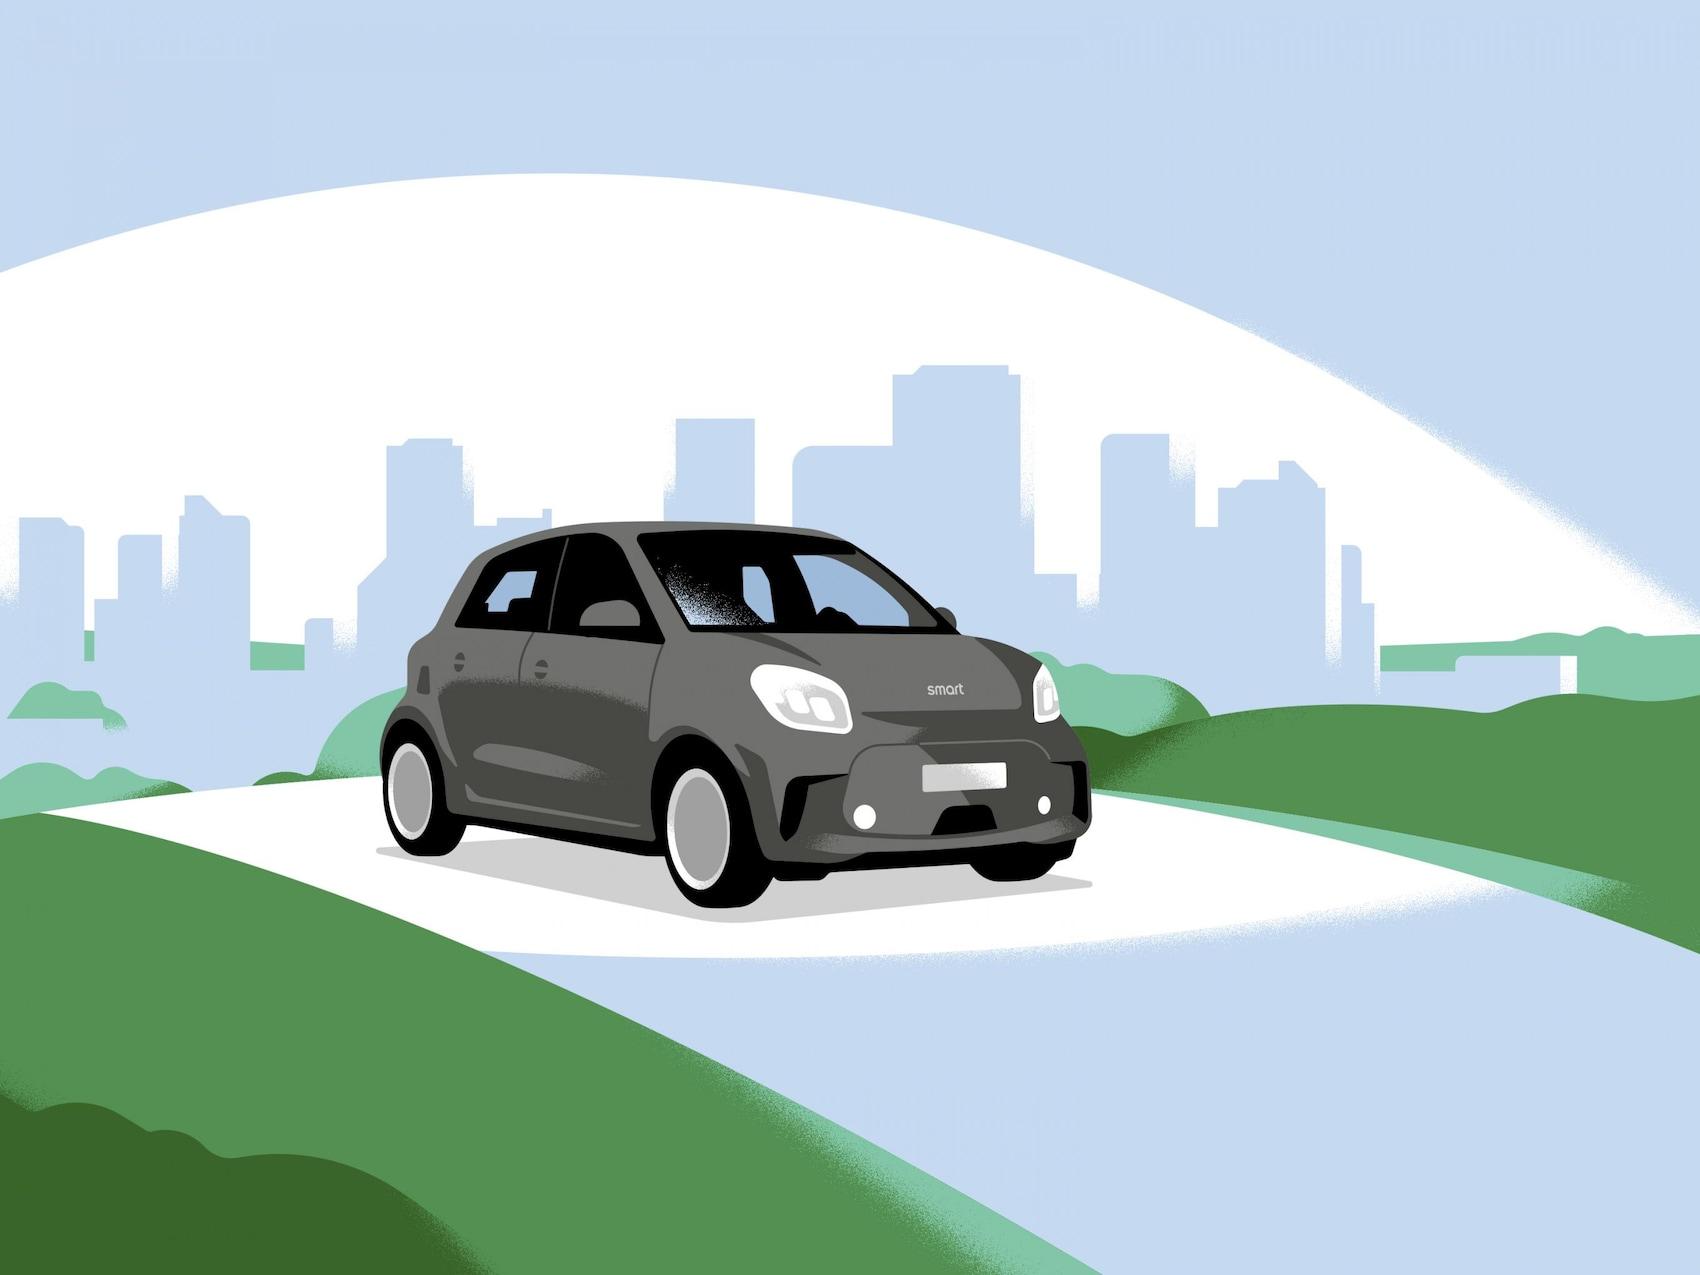 Vozilo smart EQ forfour na cesti z mestom v ozadju.